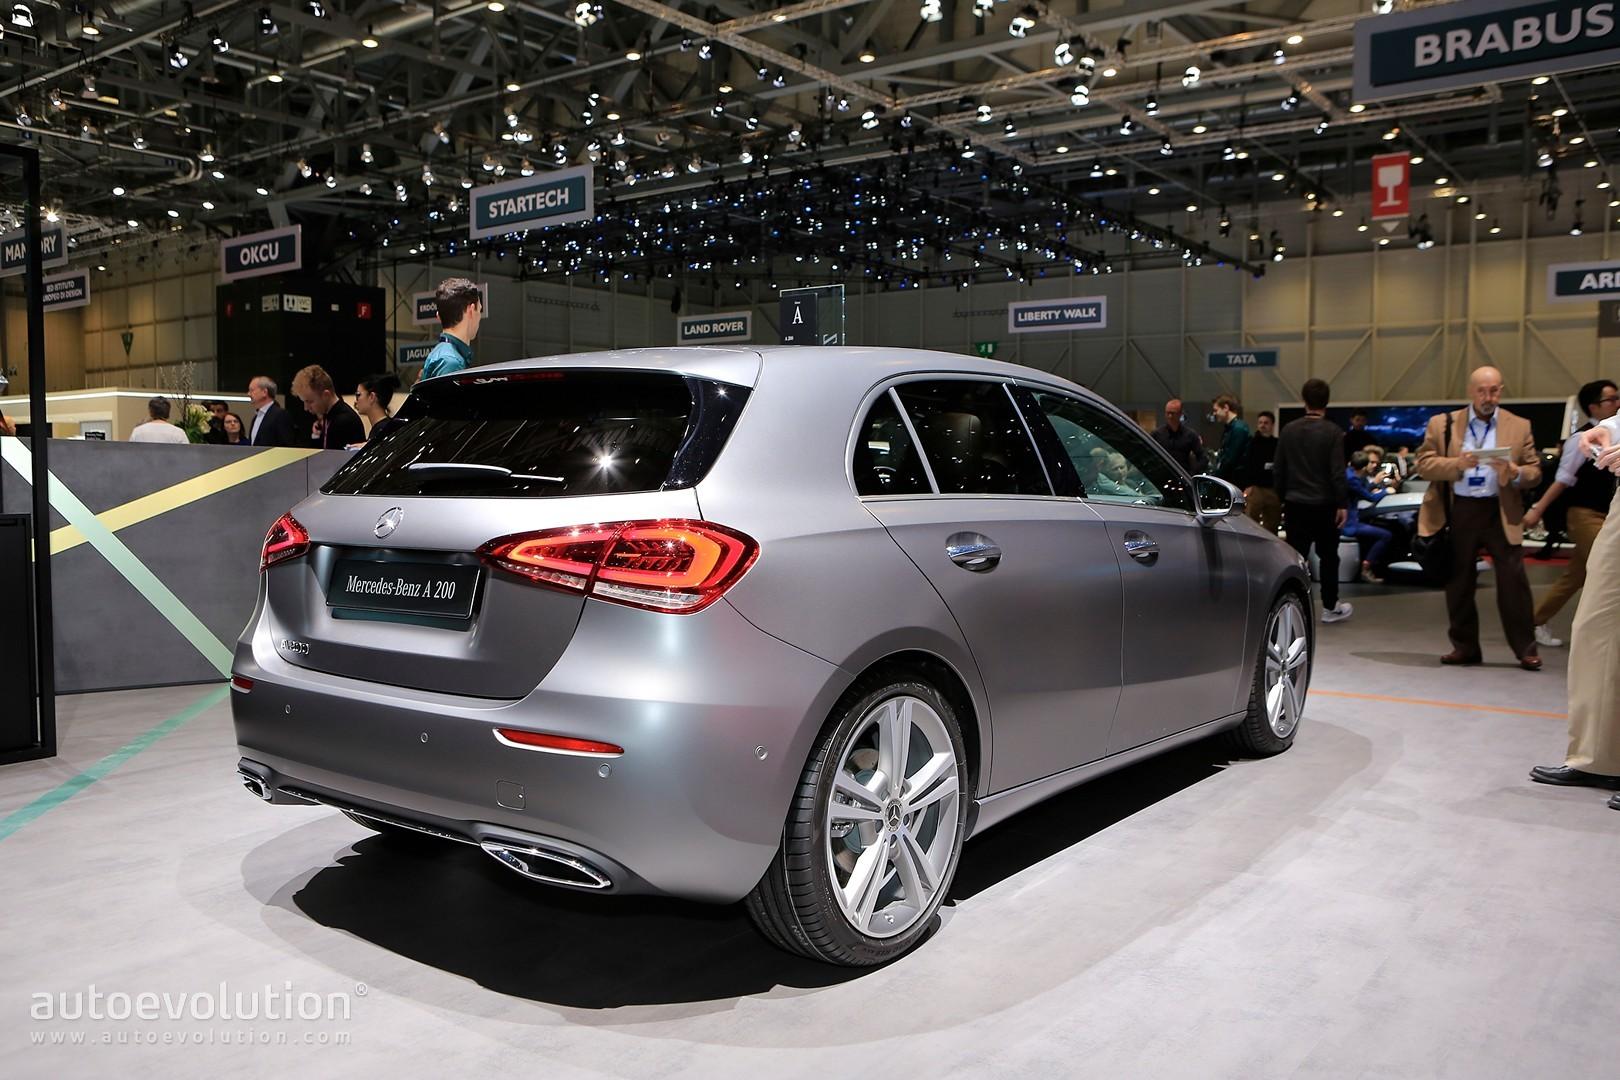 Fiat Electric Car >> 2019 Mercedes-Benz A-Class Redefines the Premium Compact in Geneva - autoevolution